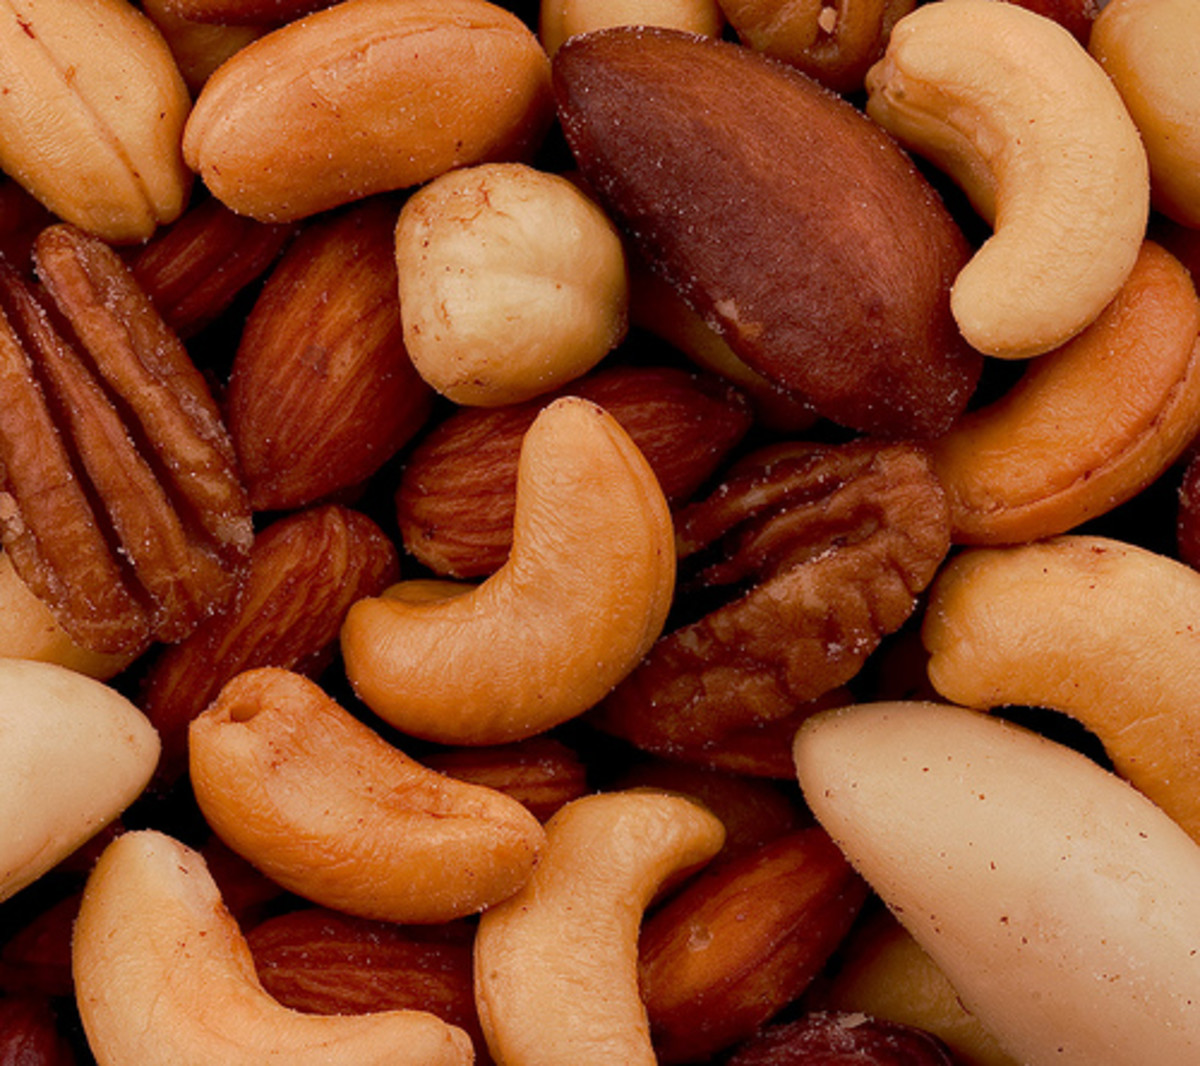 Mixed nuts- pecans, cashews, Brazil nuts, a good source of Vitamin E